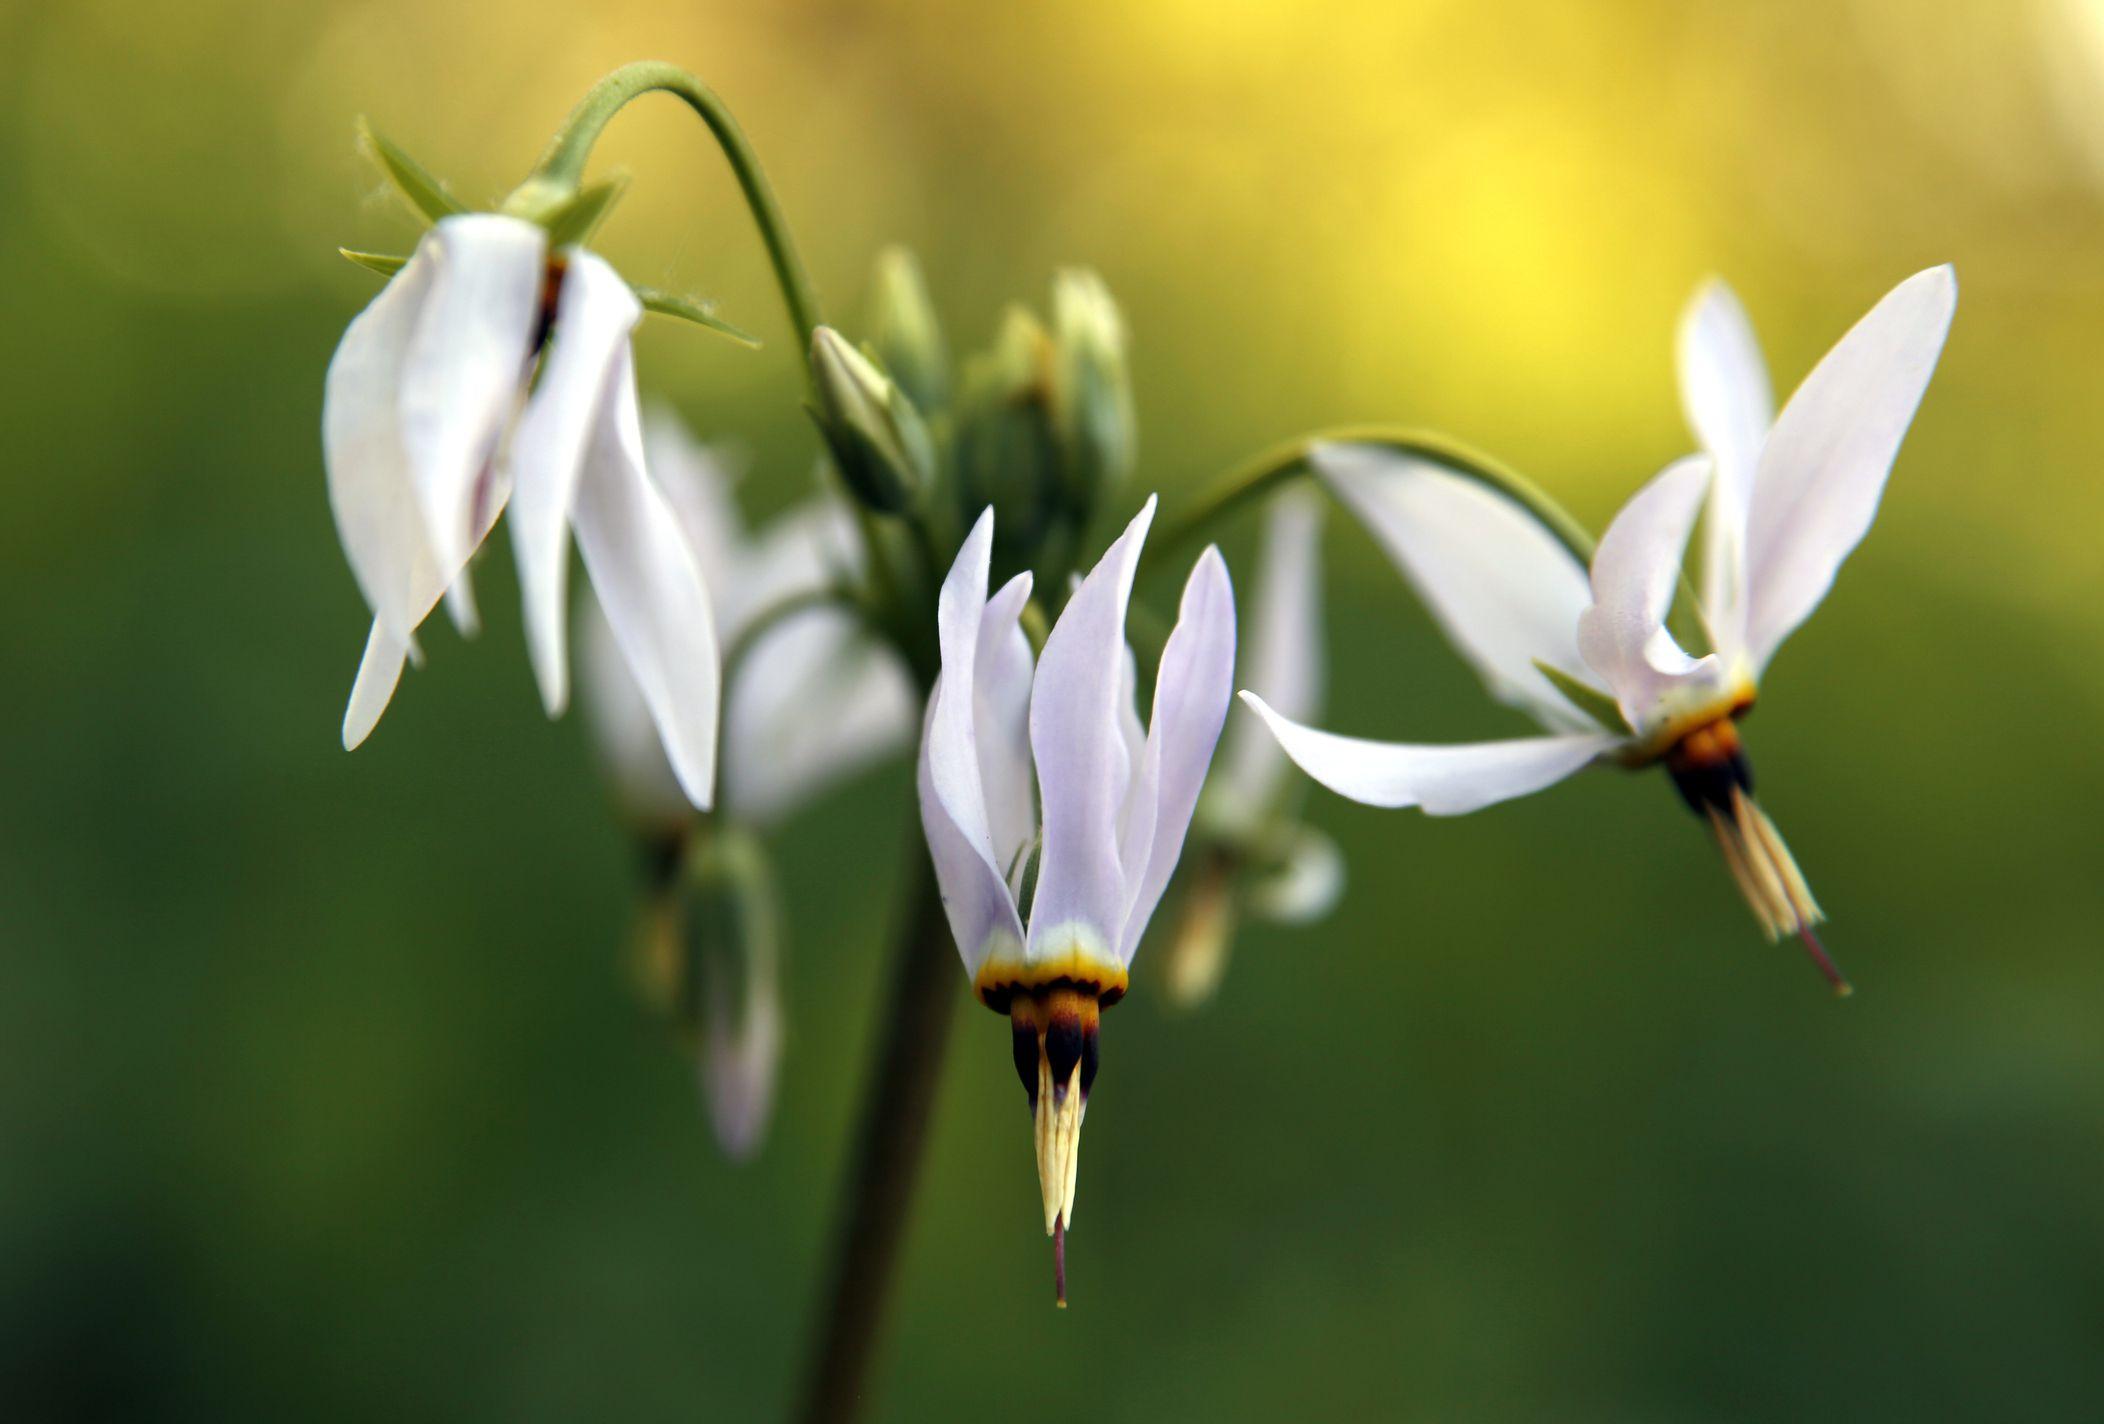 White Shooting Star Flowers